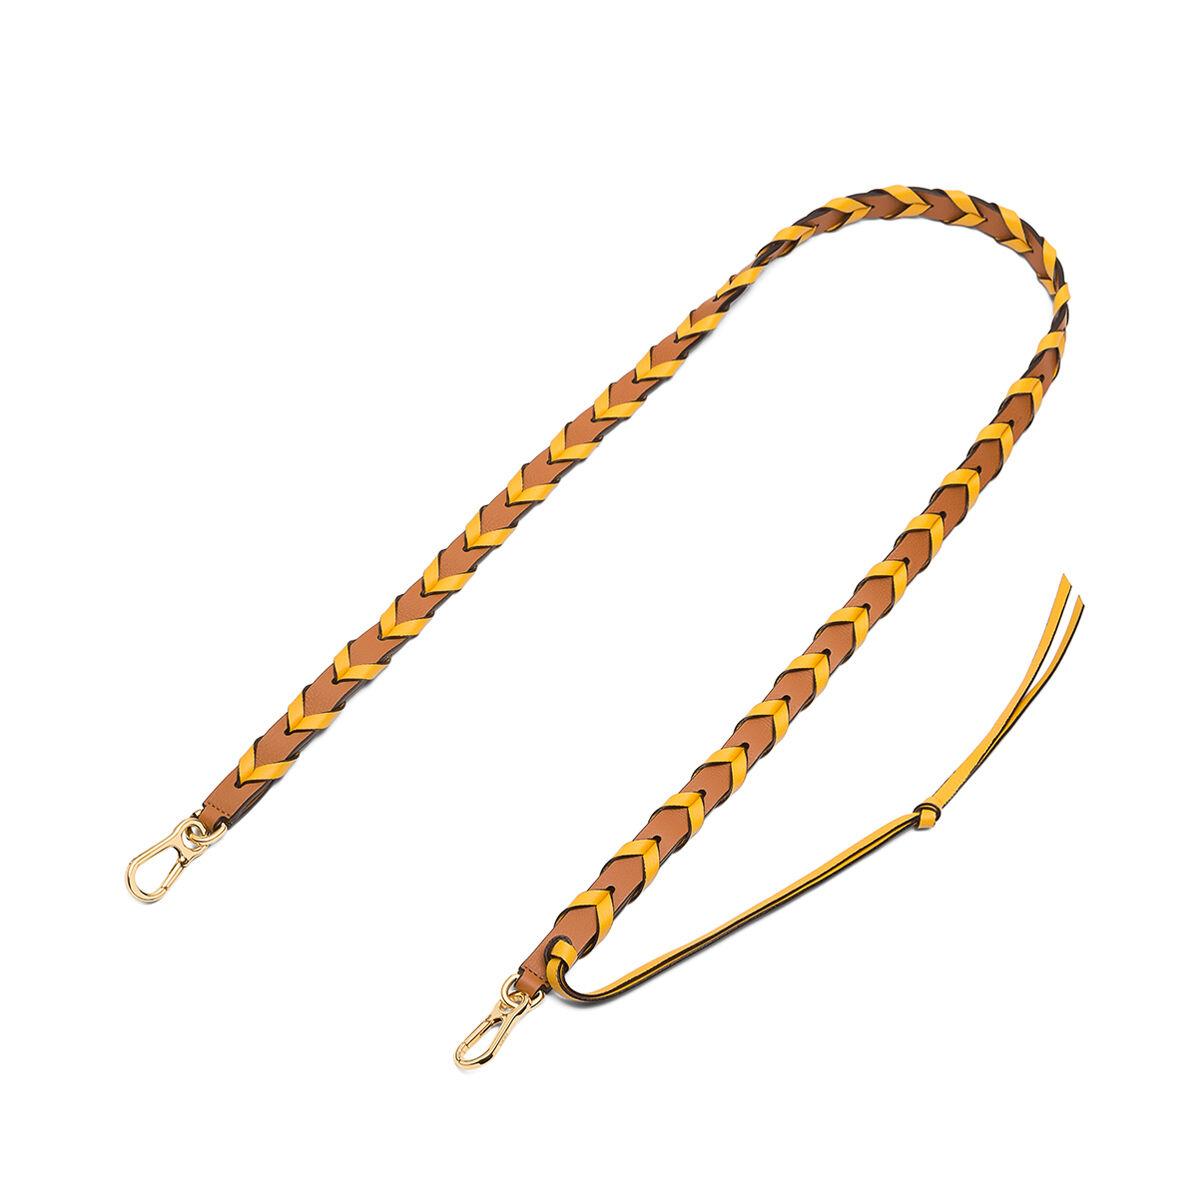 LOEWE Braided Thin Strap Light Caramel/Yellow Mango front